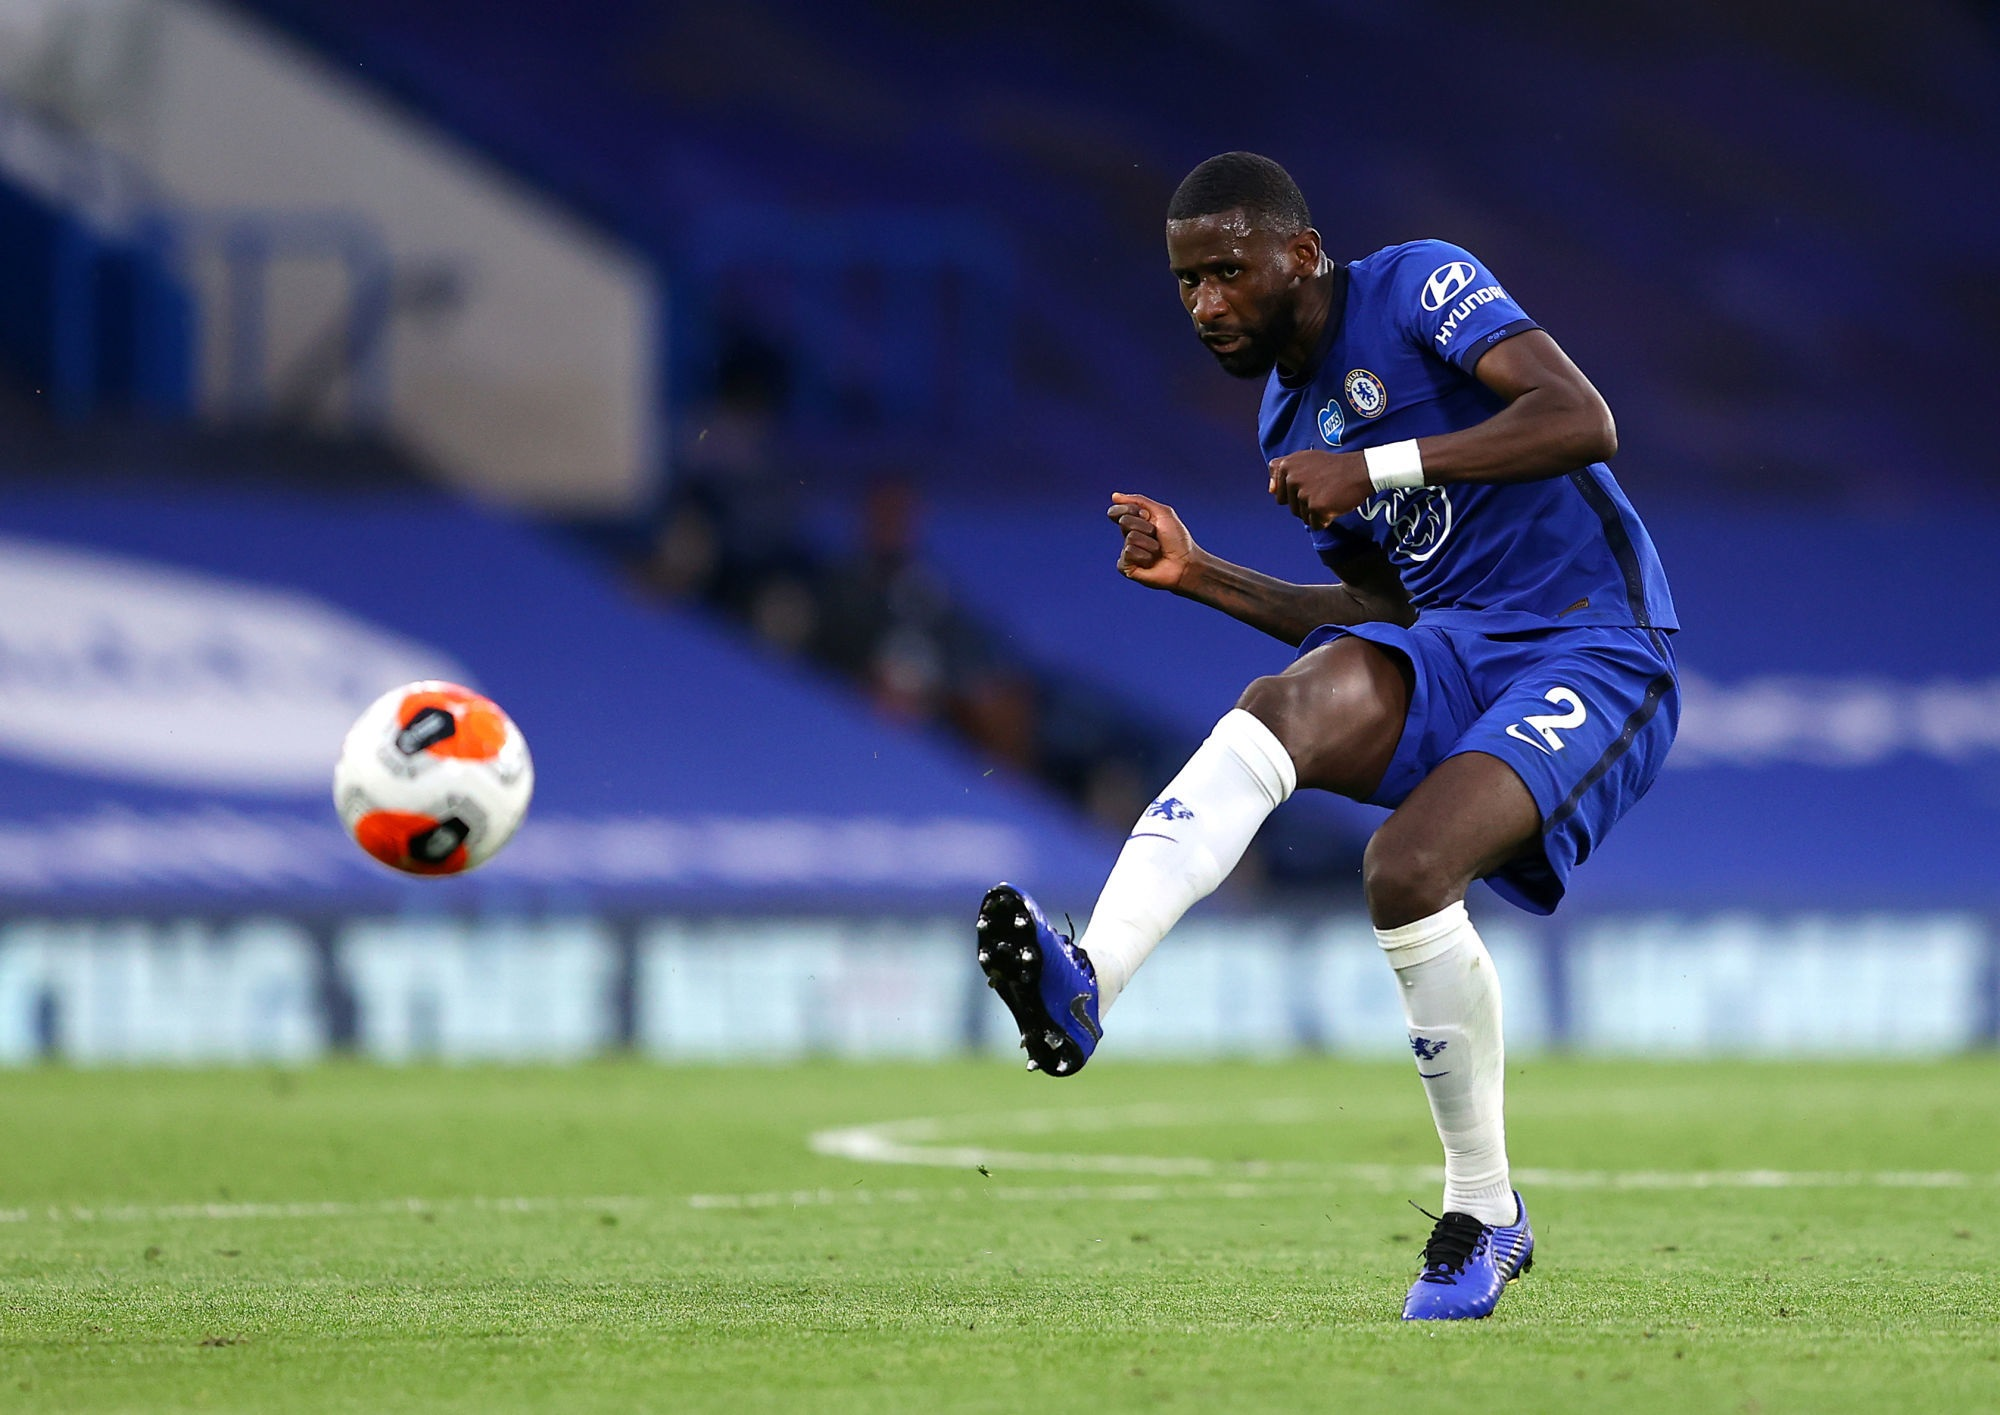 Mercato - Antonio Rüdiger, le PSG négocie avec Chelsea, annonce RMC Sport